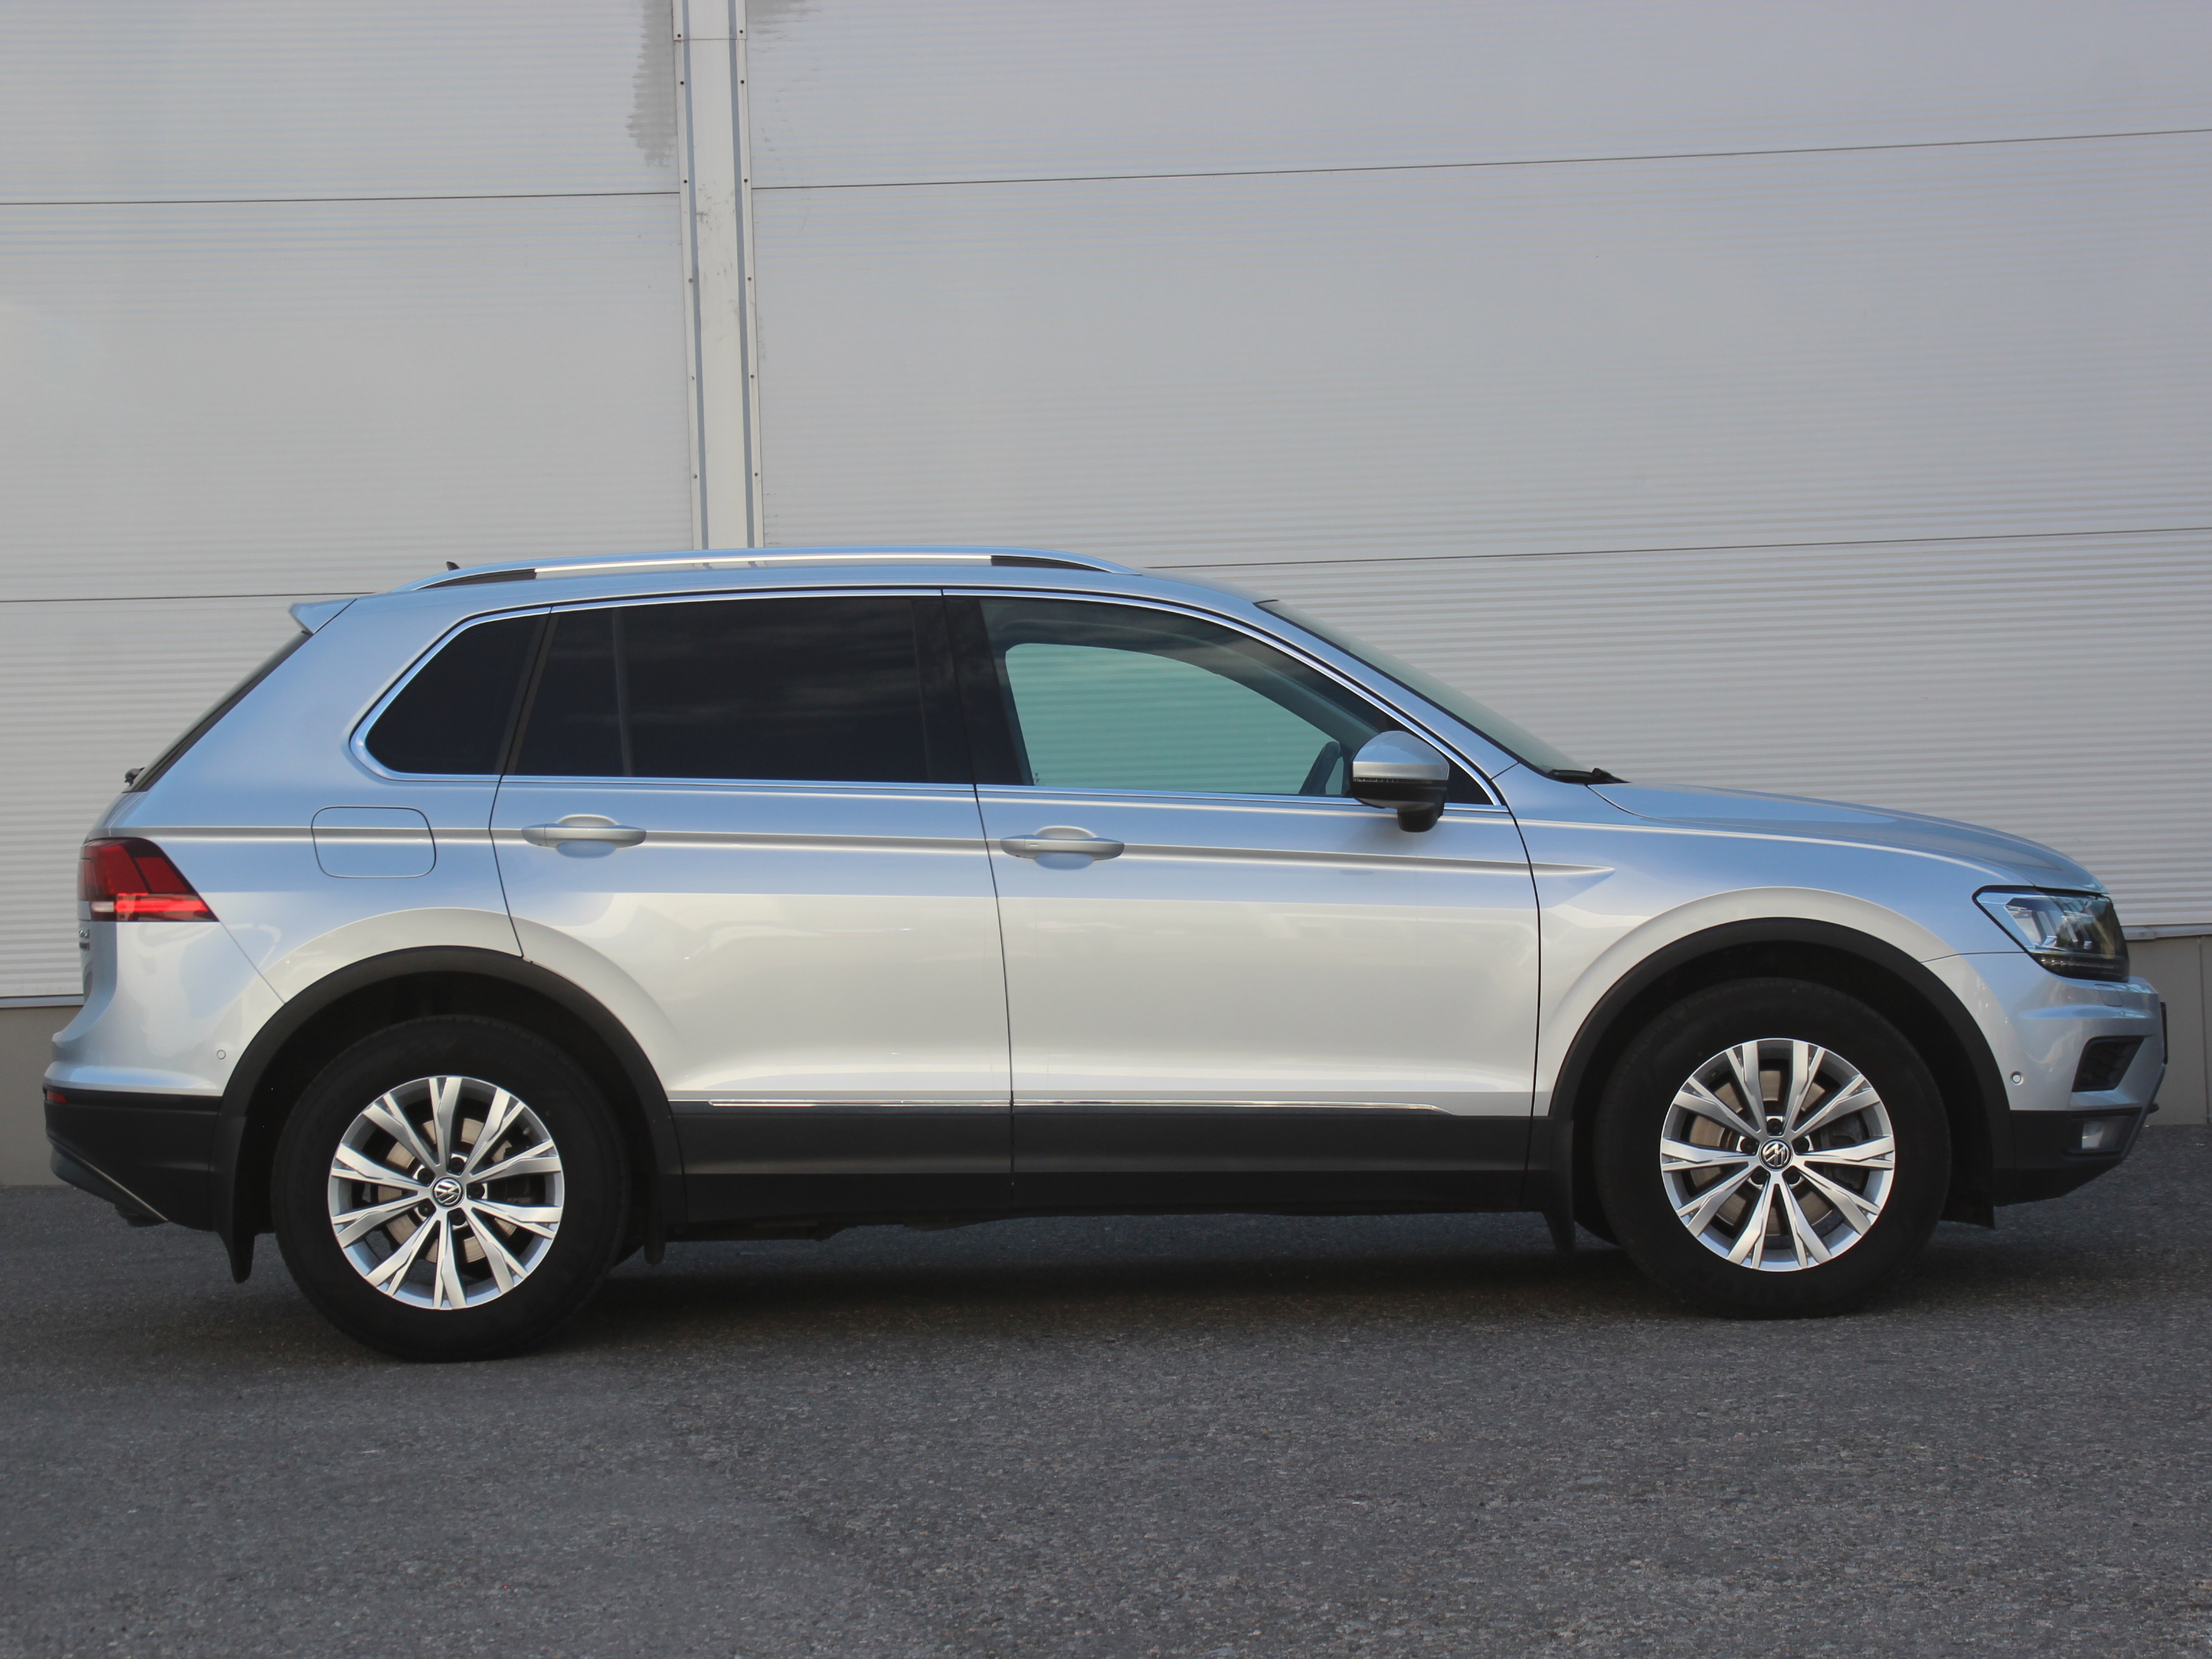 Volkswagen Tiguan Внедорожник (2018г.)